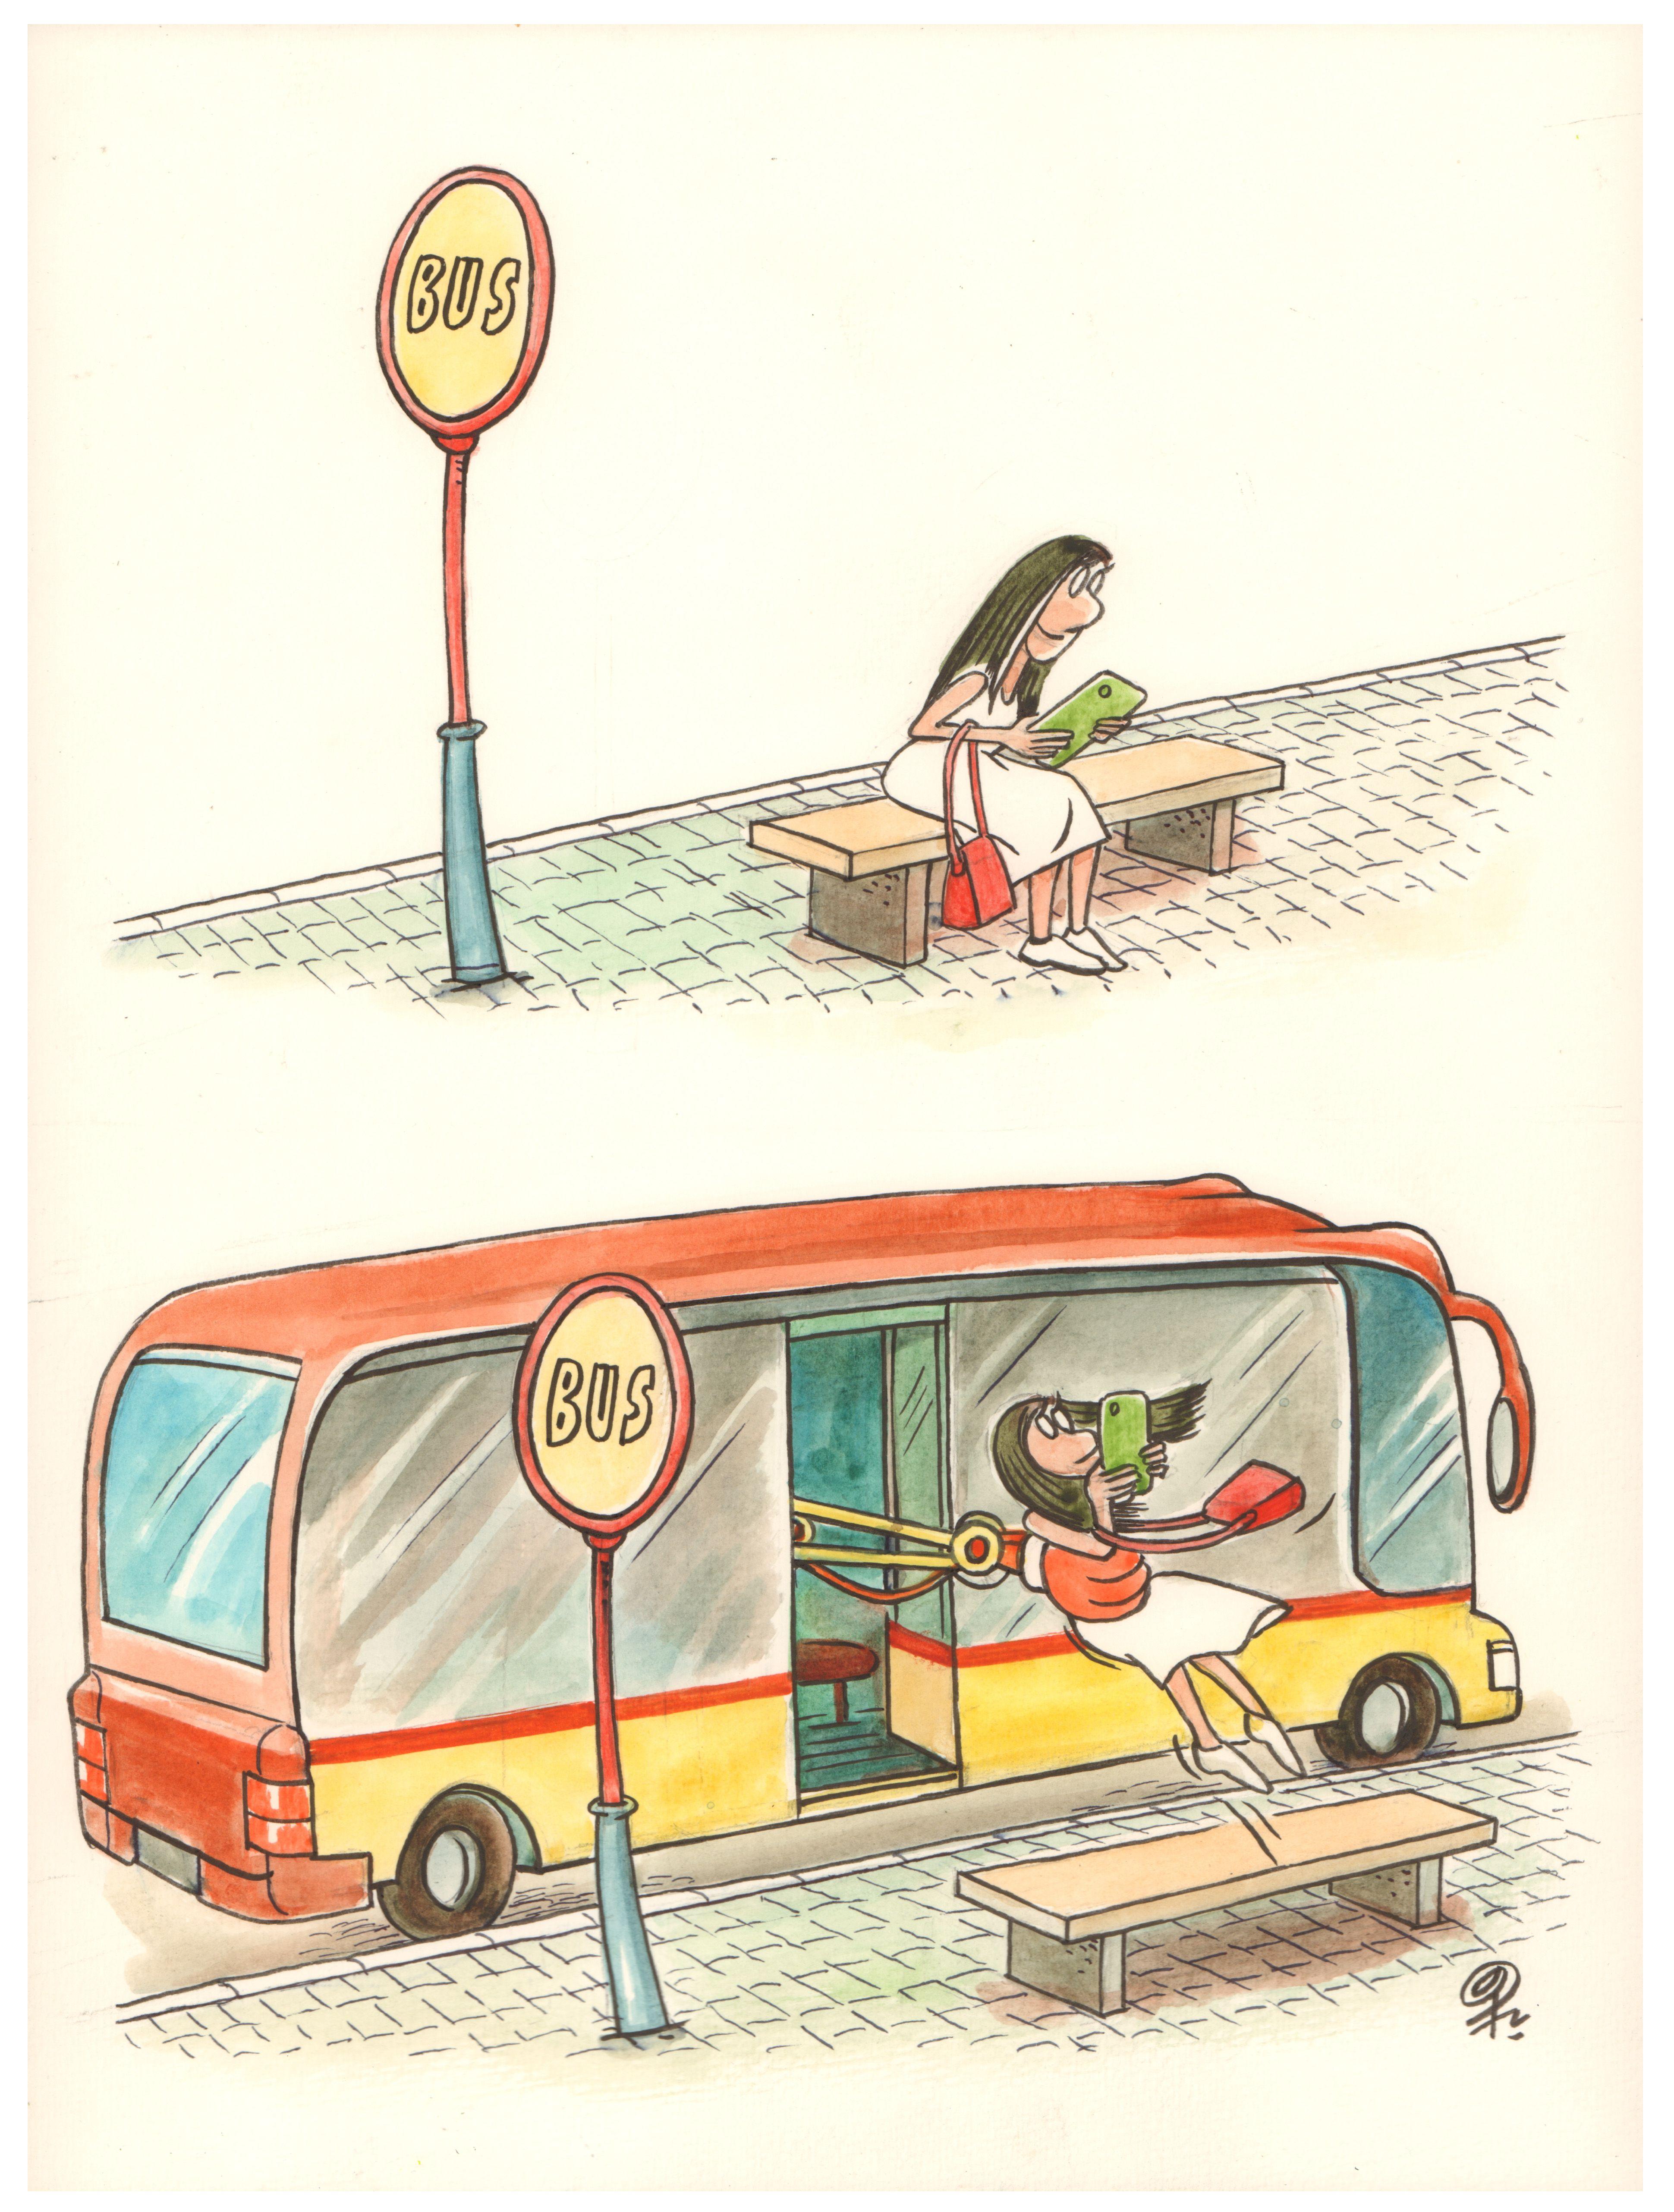 No Title - Global Mobilty Cartoon Contest